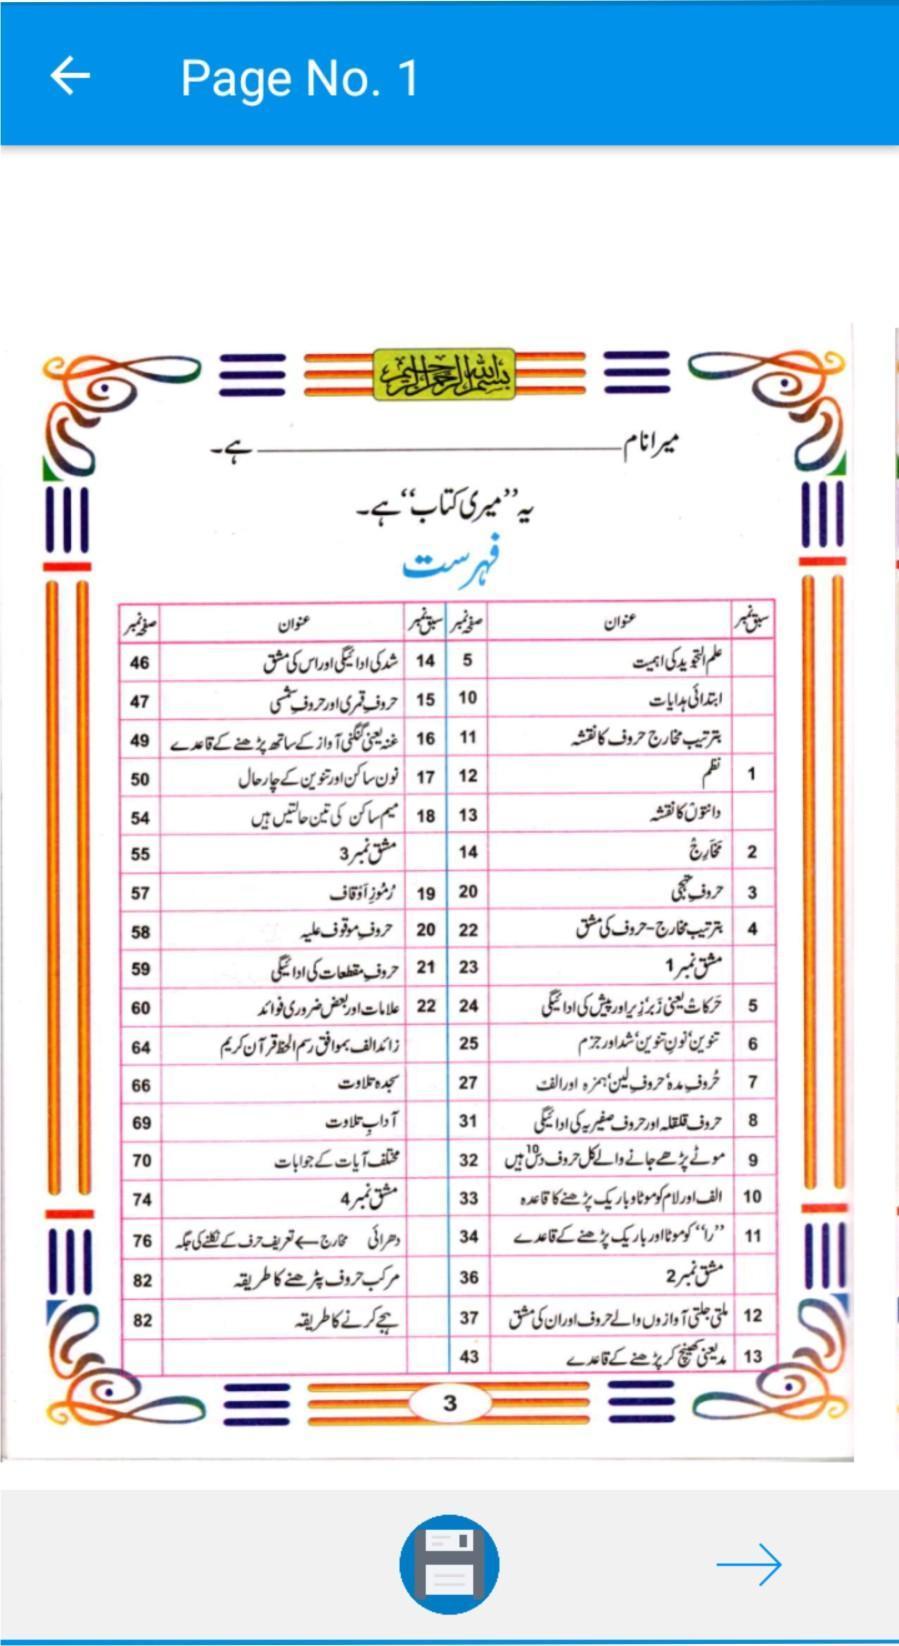 16 line tajweedi quran 4 color coded in single pdf file download free.